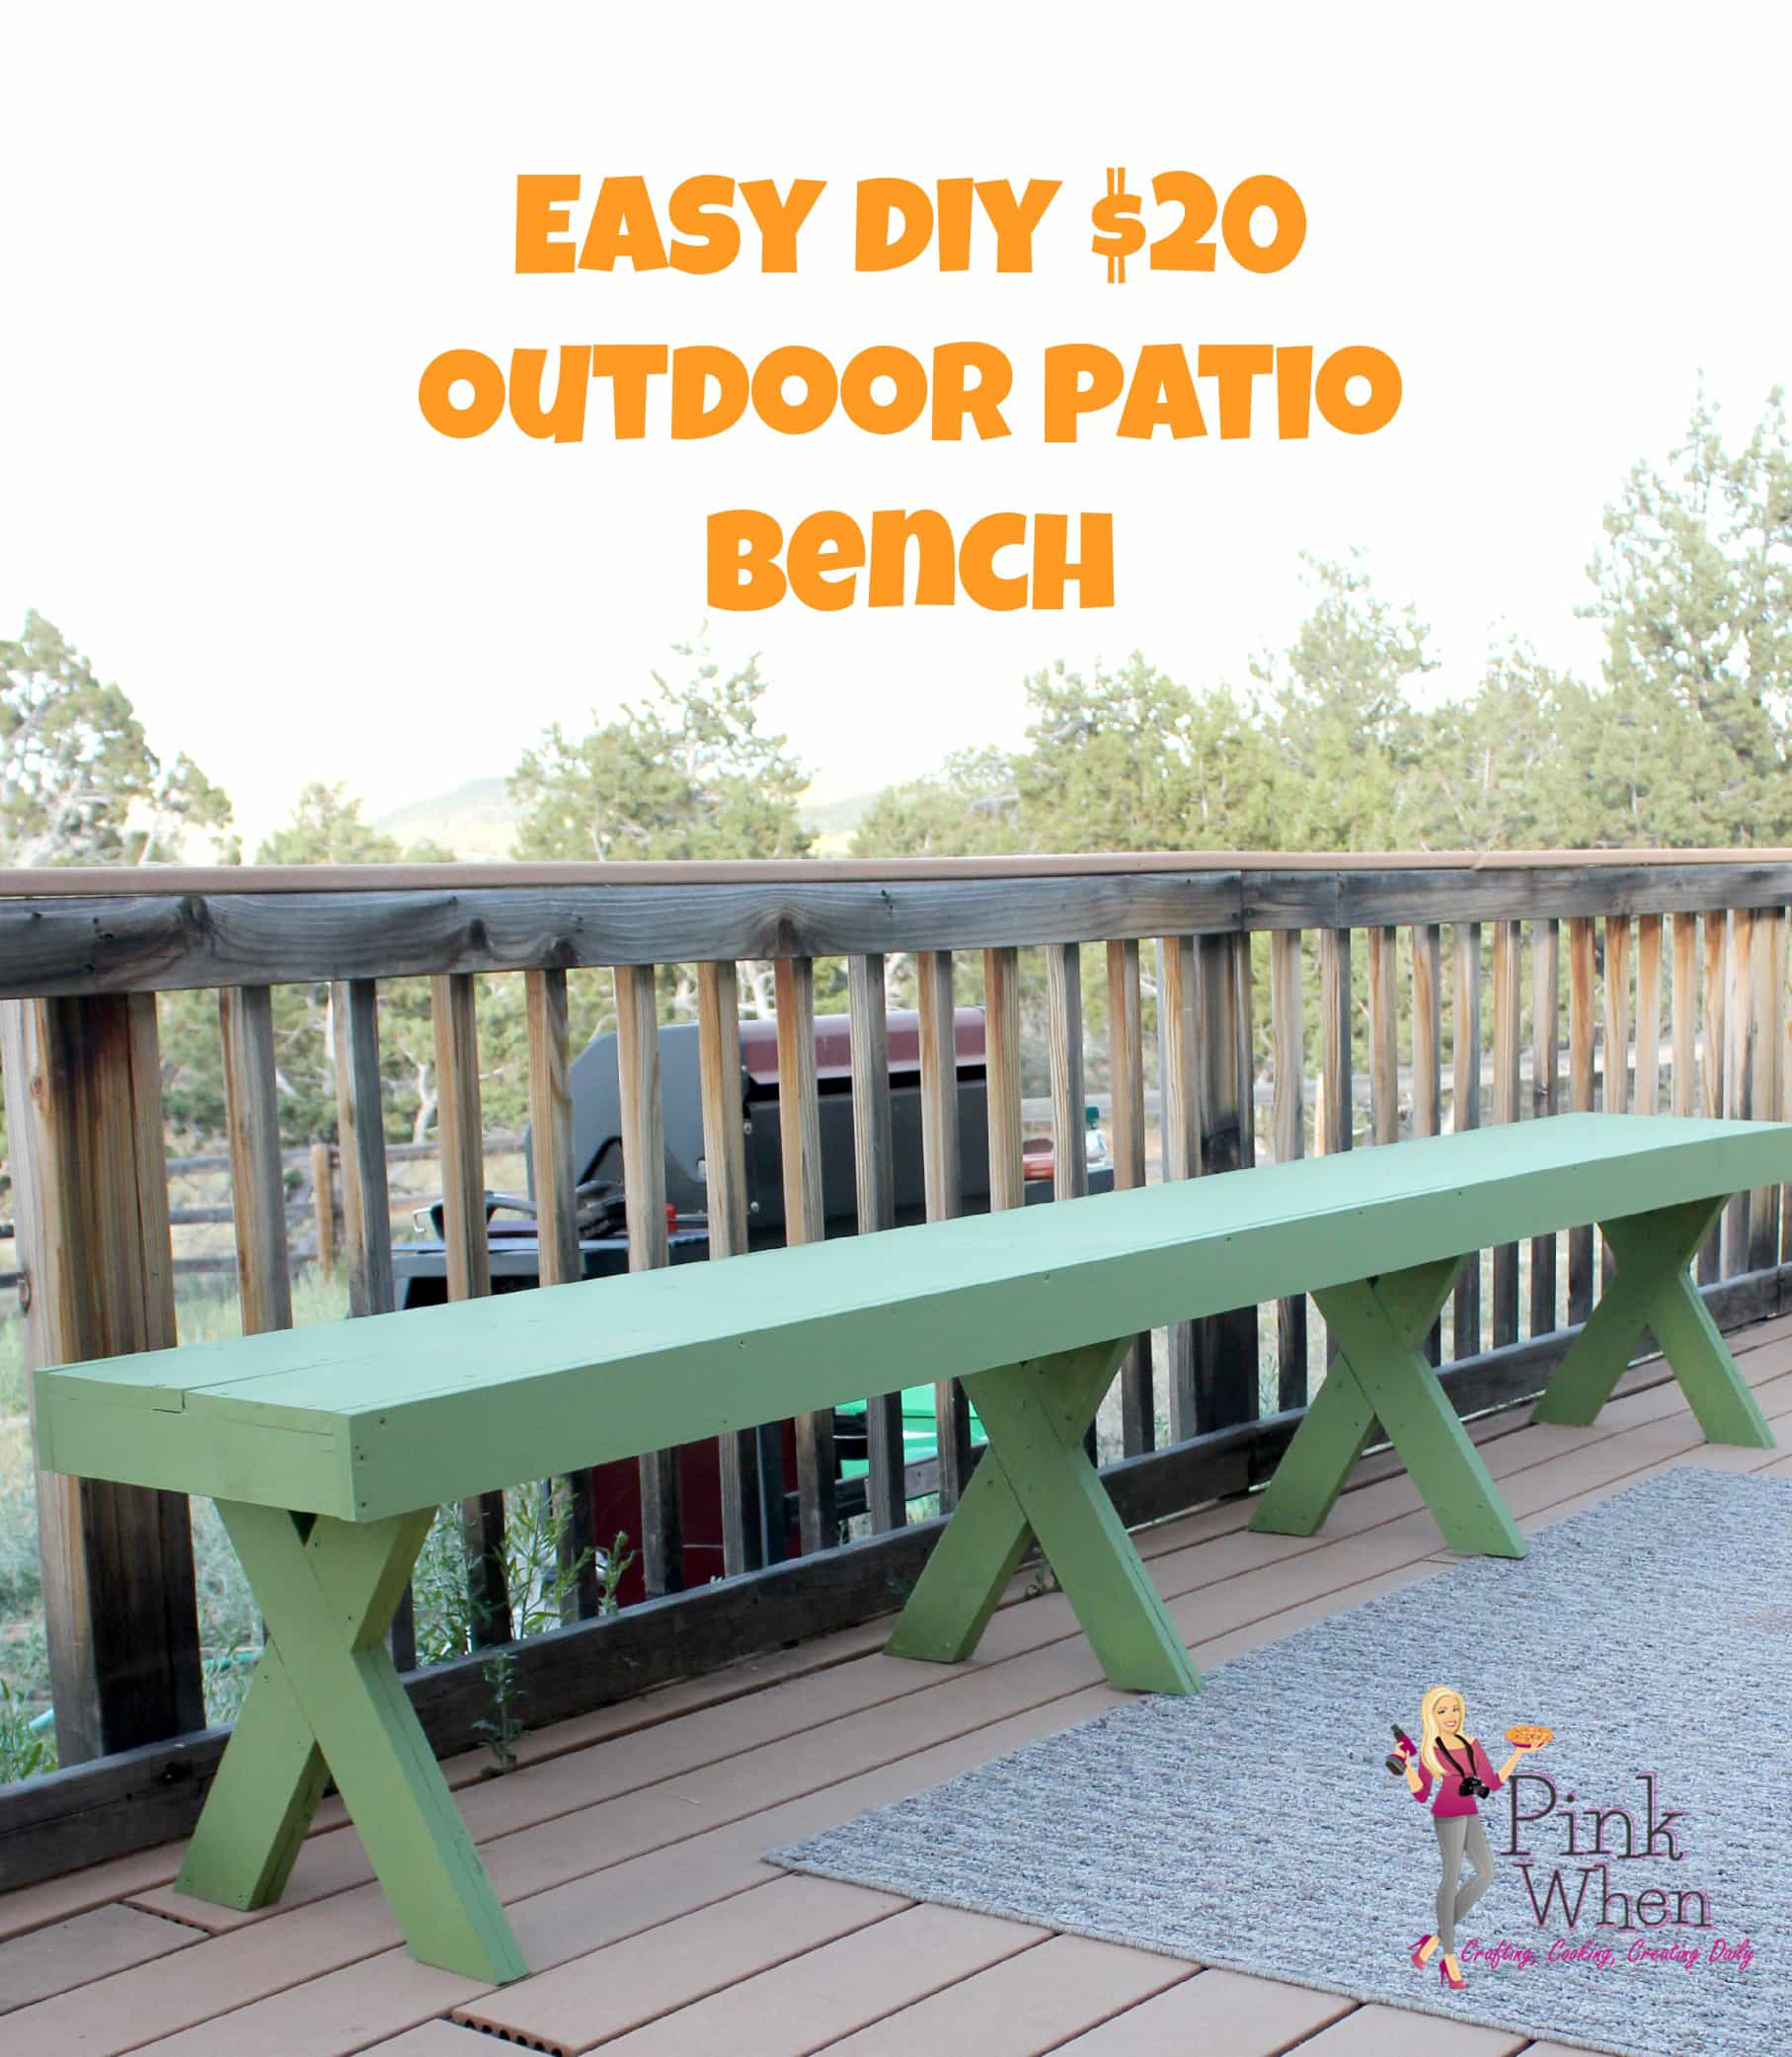 DIY $20 Outdoor Patio Bench - PinkWhen on Build Backyard Patio id=29172